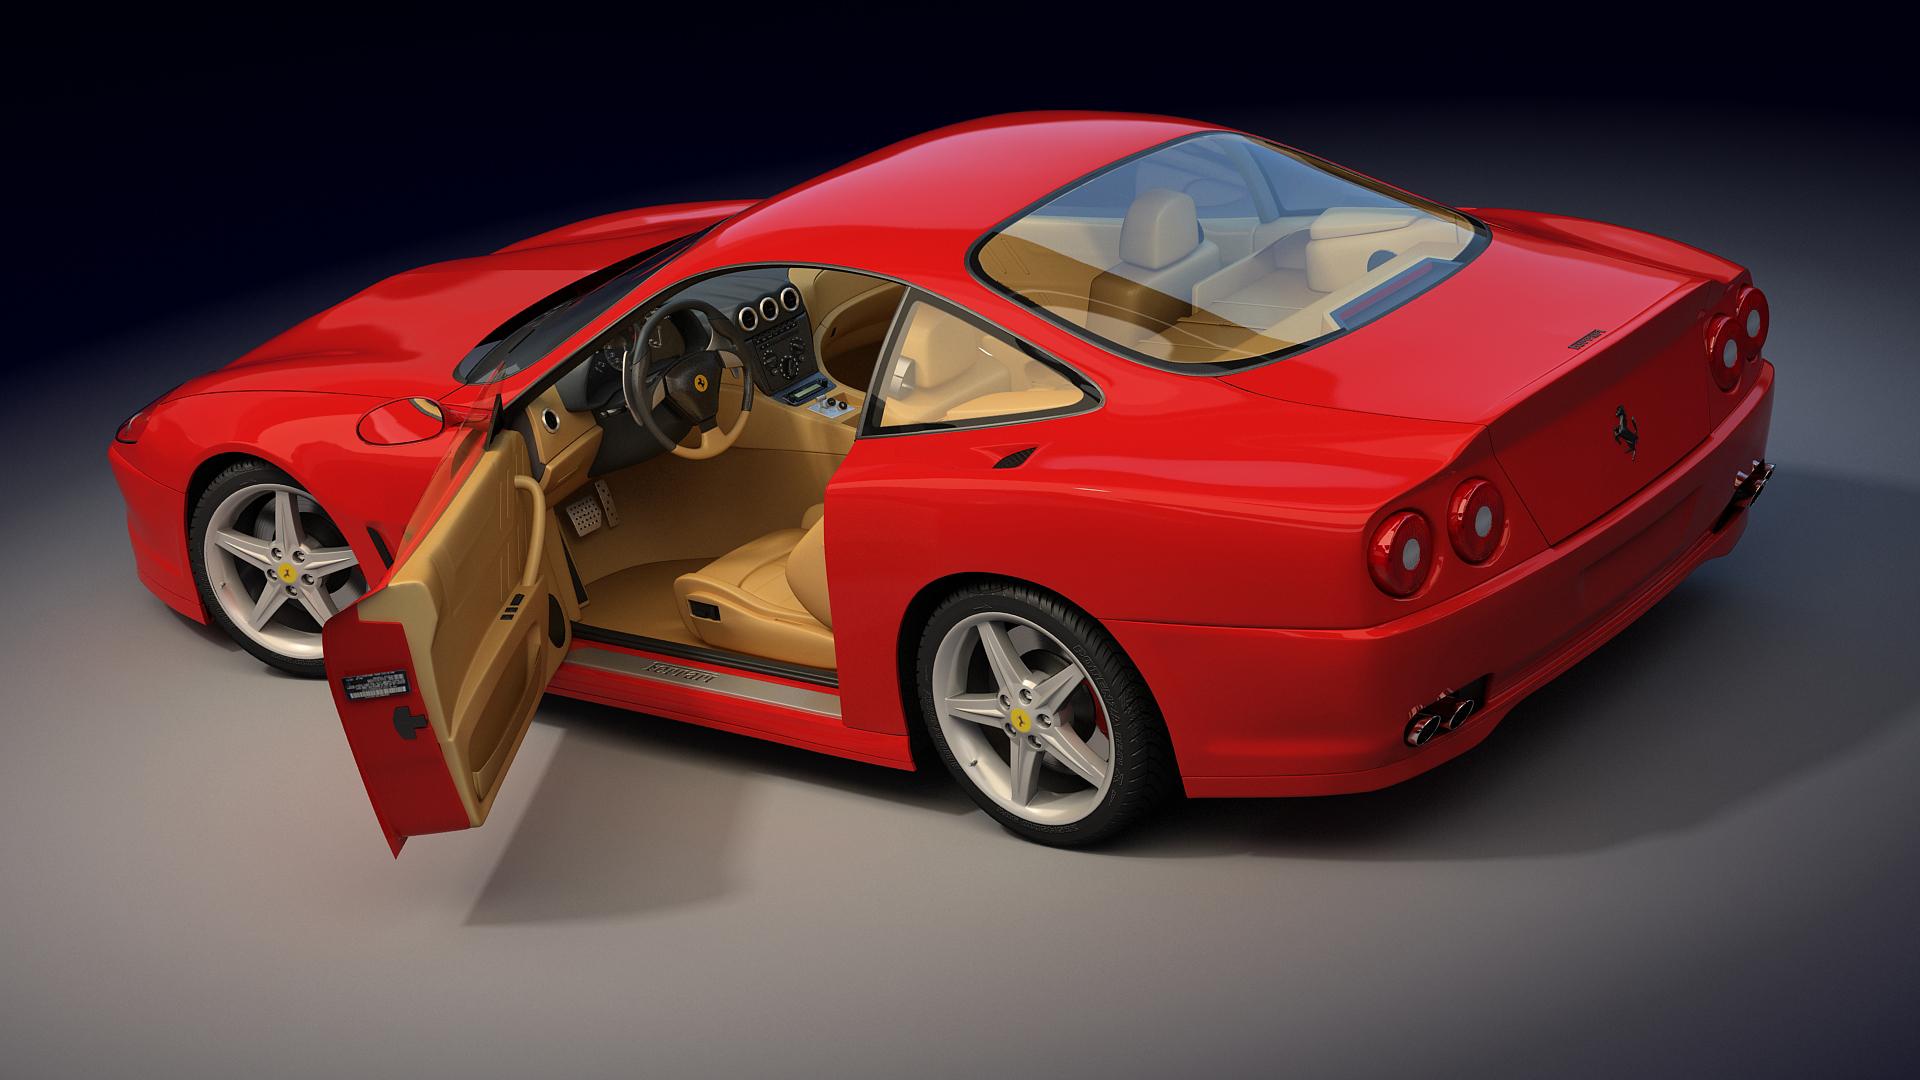 ferrari-maranello-01 Marvelous Photo Ferrari Mondial 8 Quattrovalvole Rouge Occasion Cars Trend